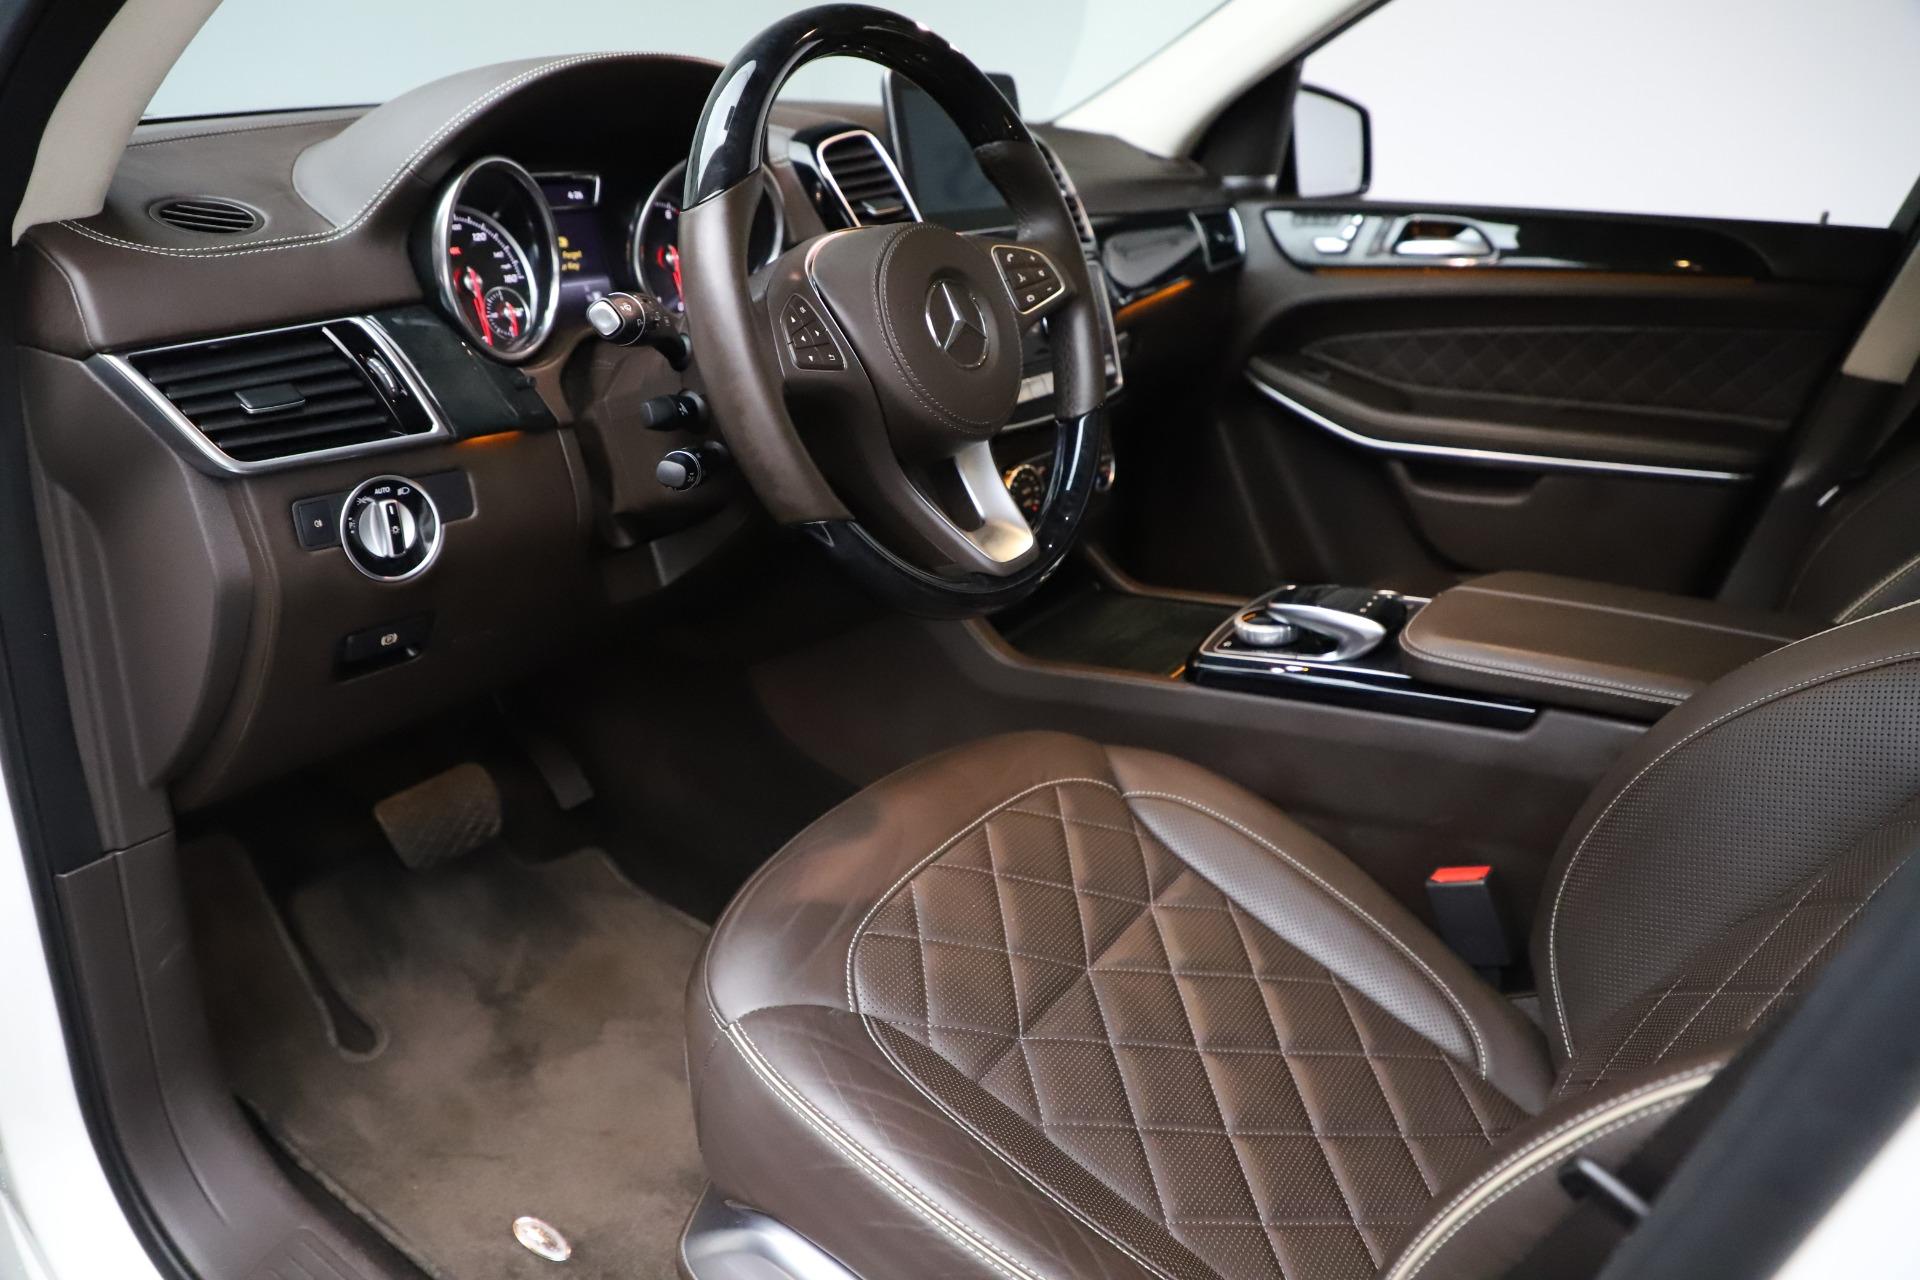 Used 2018 Mercedes Benz GLS 550